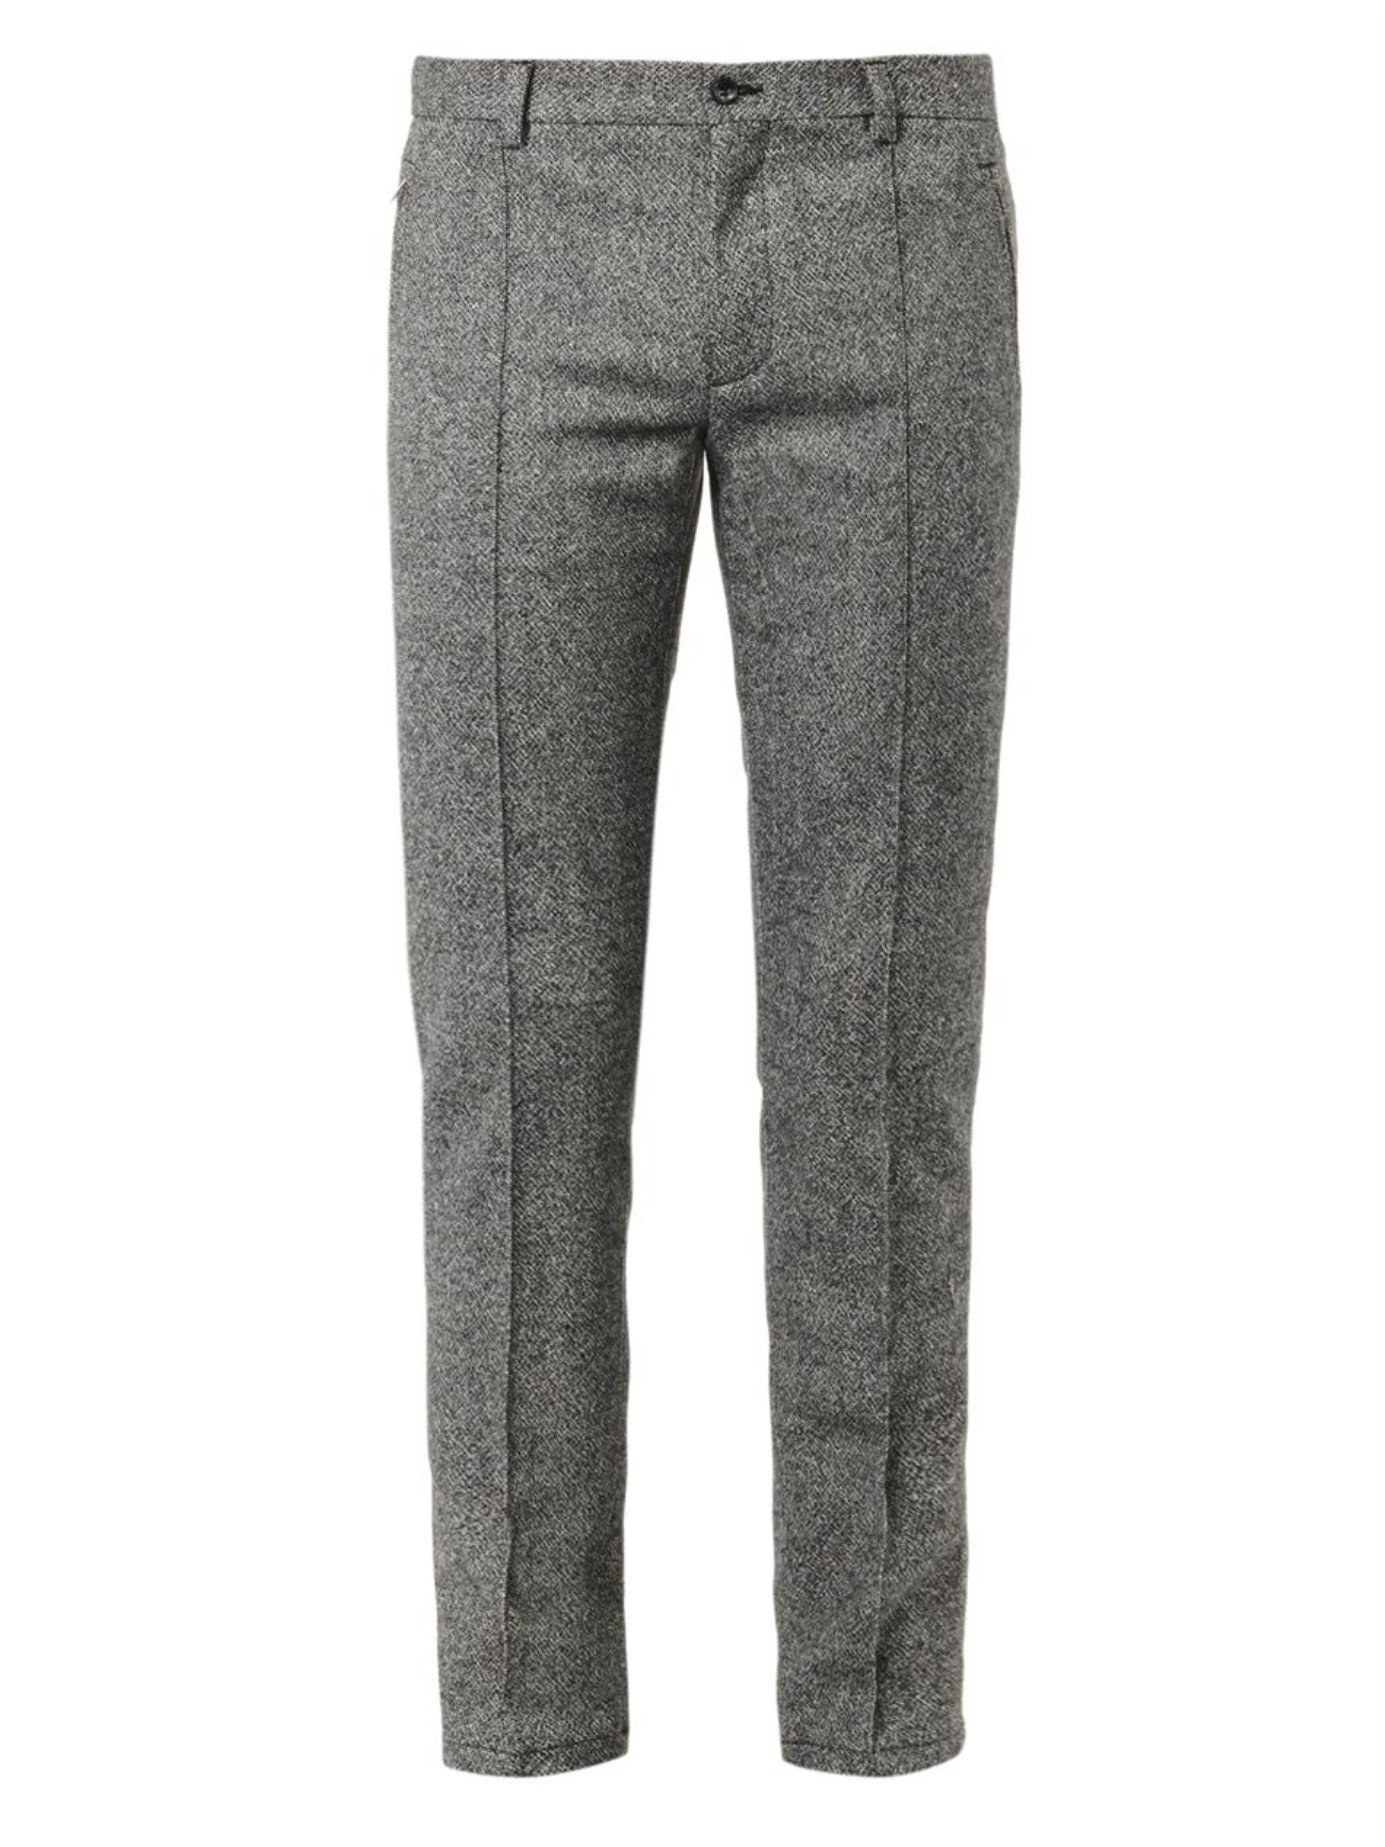 e84cfd07ab8d dolce-gabbana-light-grey-slim-leg-wool-blend-trousers -gray-product-4-785202018-normal.jpeg